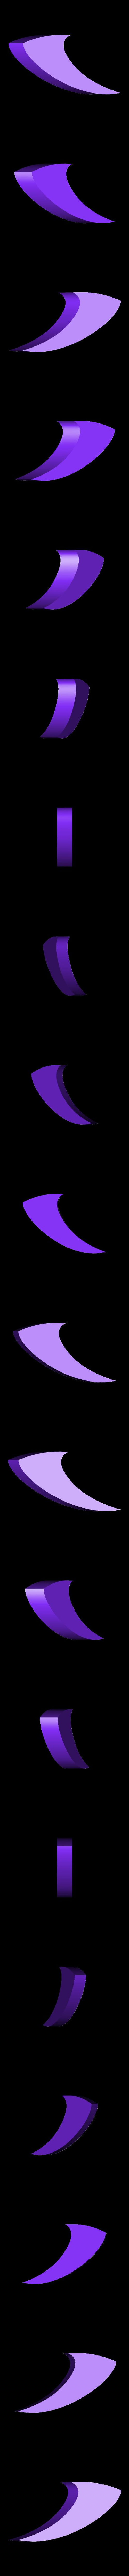 spacer_2.stl Download free STL file Leading-Edge Slats for Horten Wing Stiletto • 3D printer model, wersy